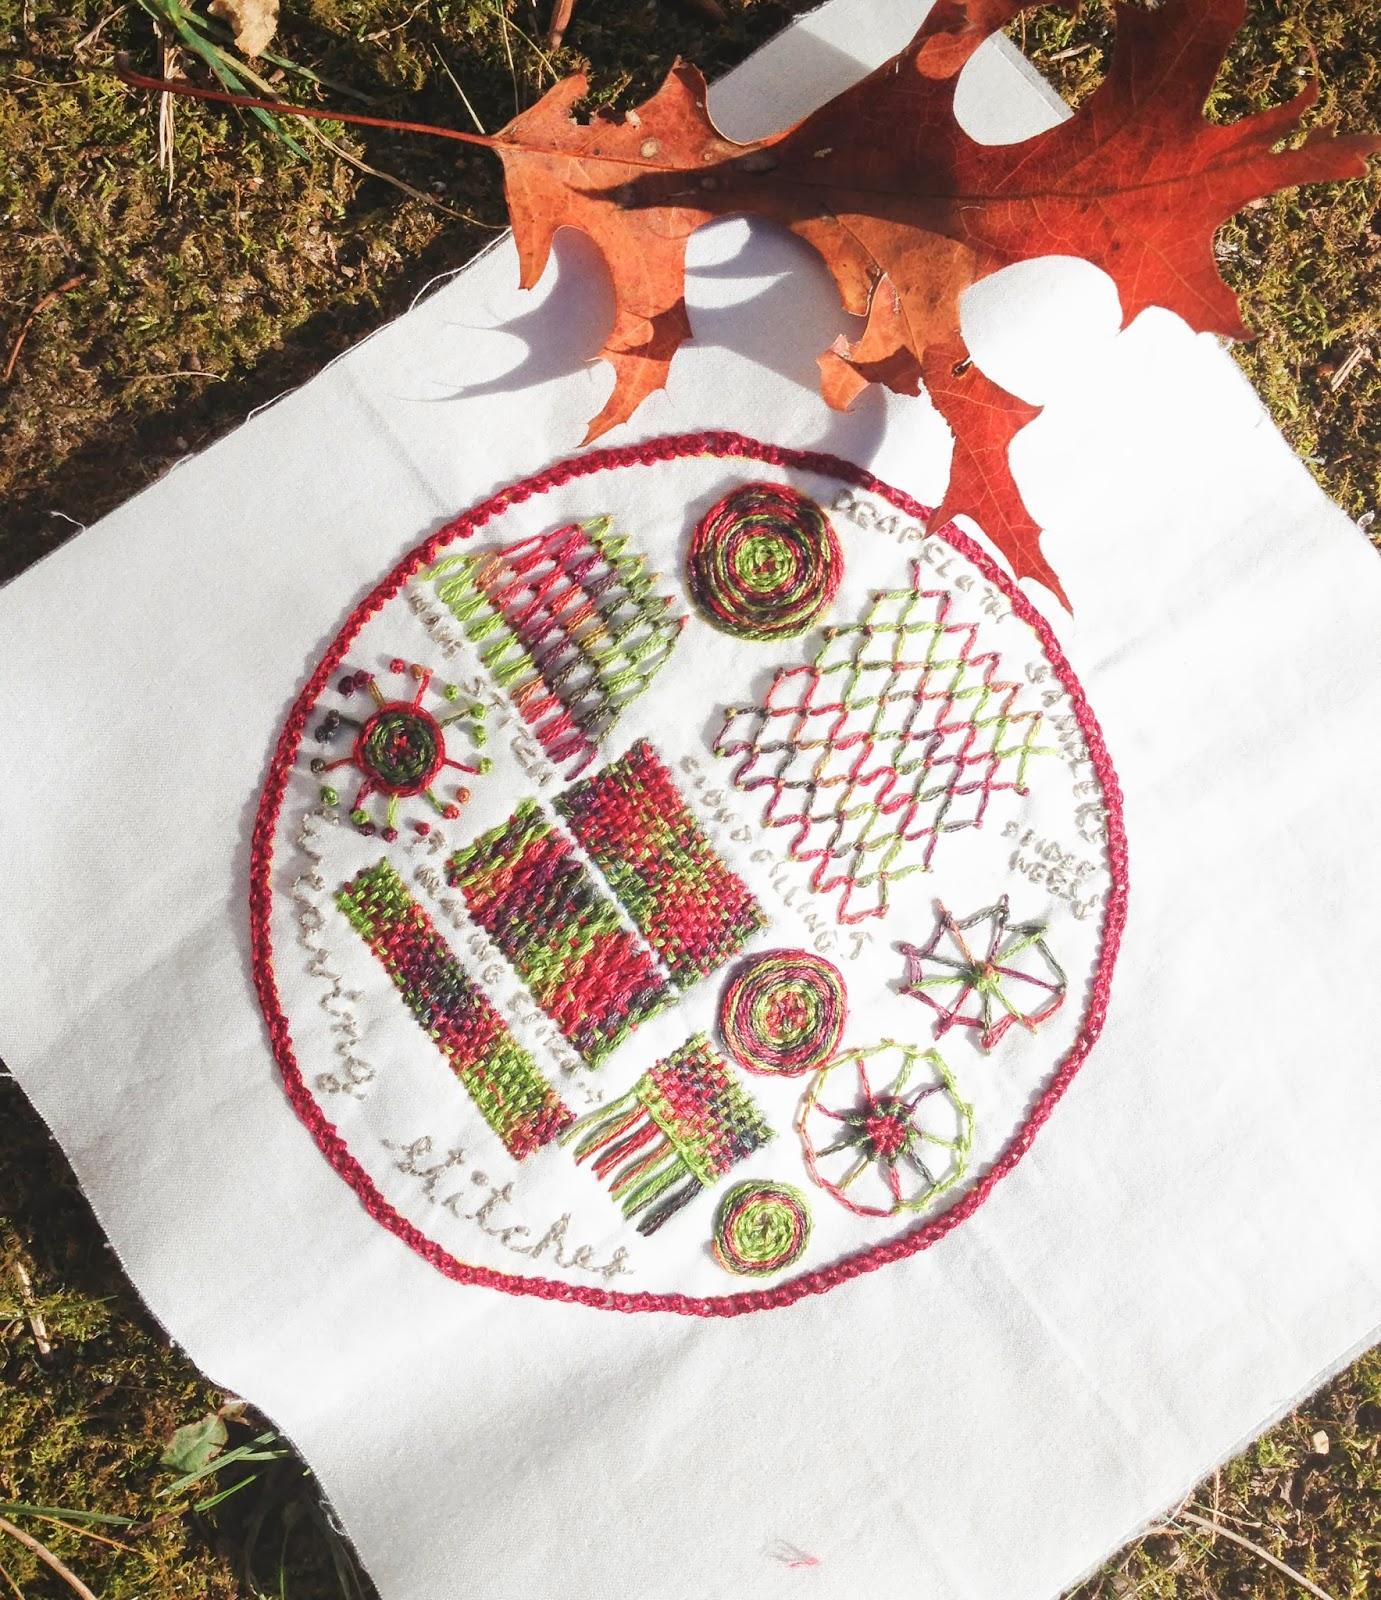 Drop cloth weaving stitches sampler